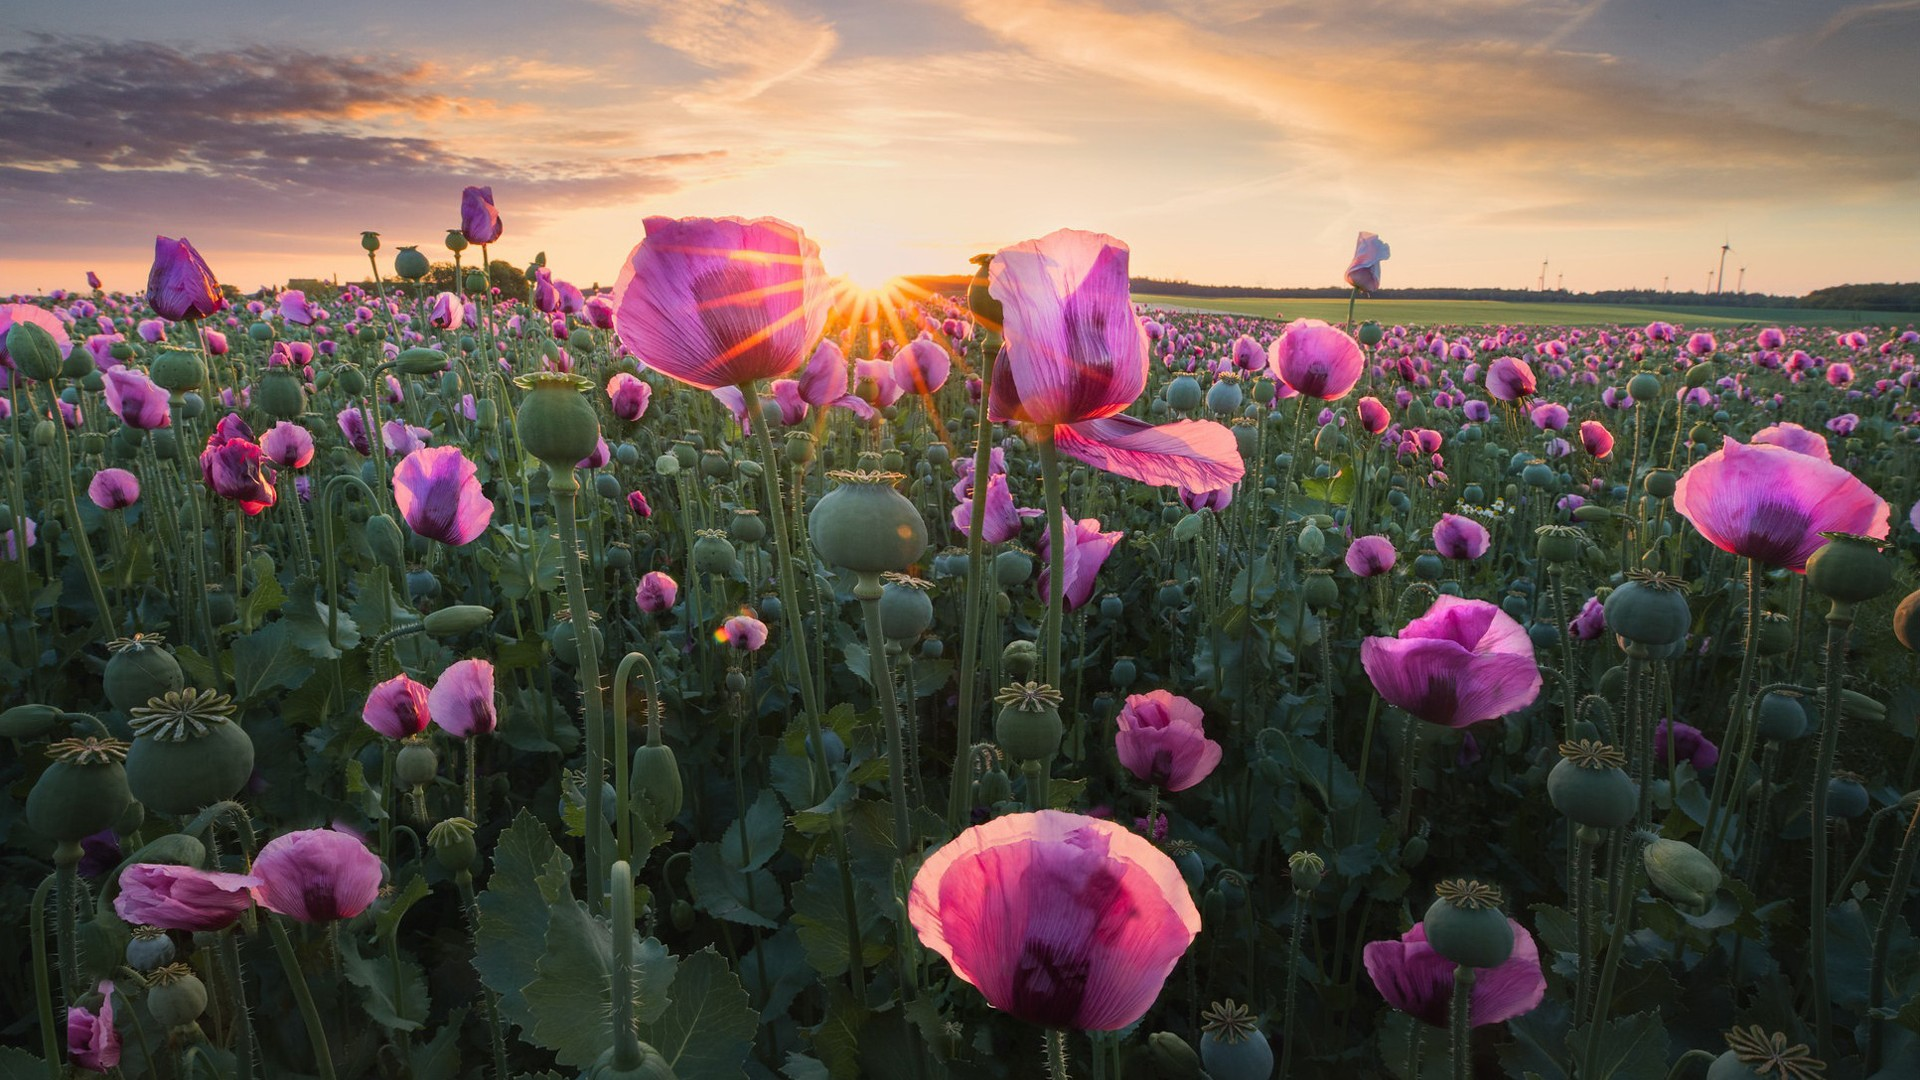 earth poppy pink flower during sunrise HD flowers Wallpaper